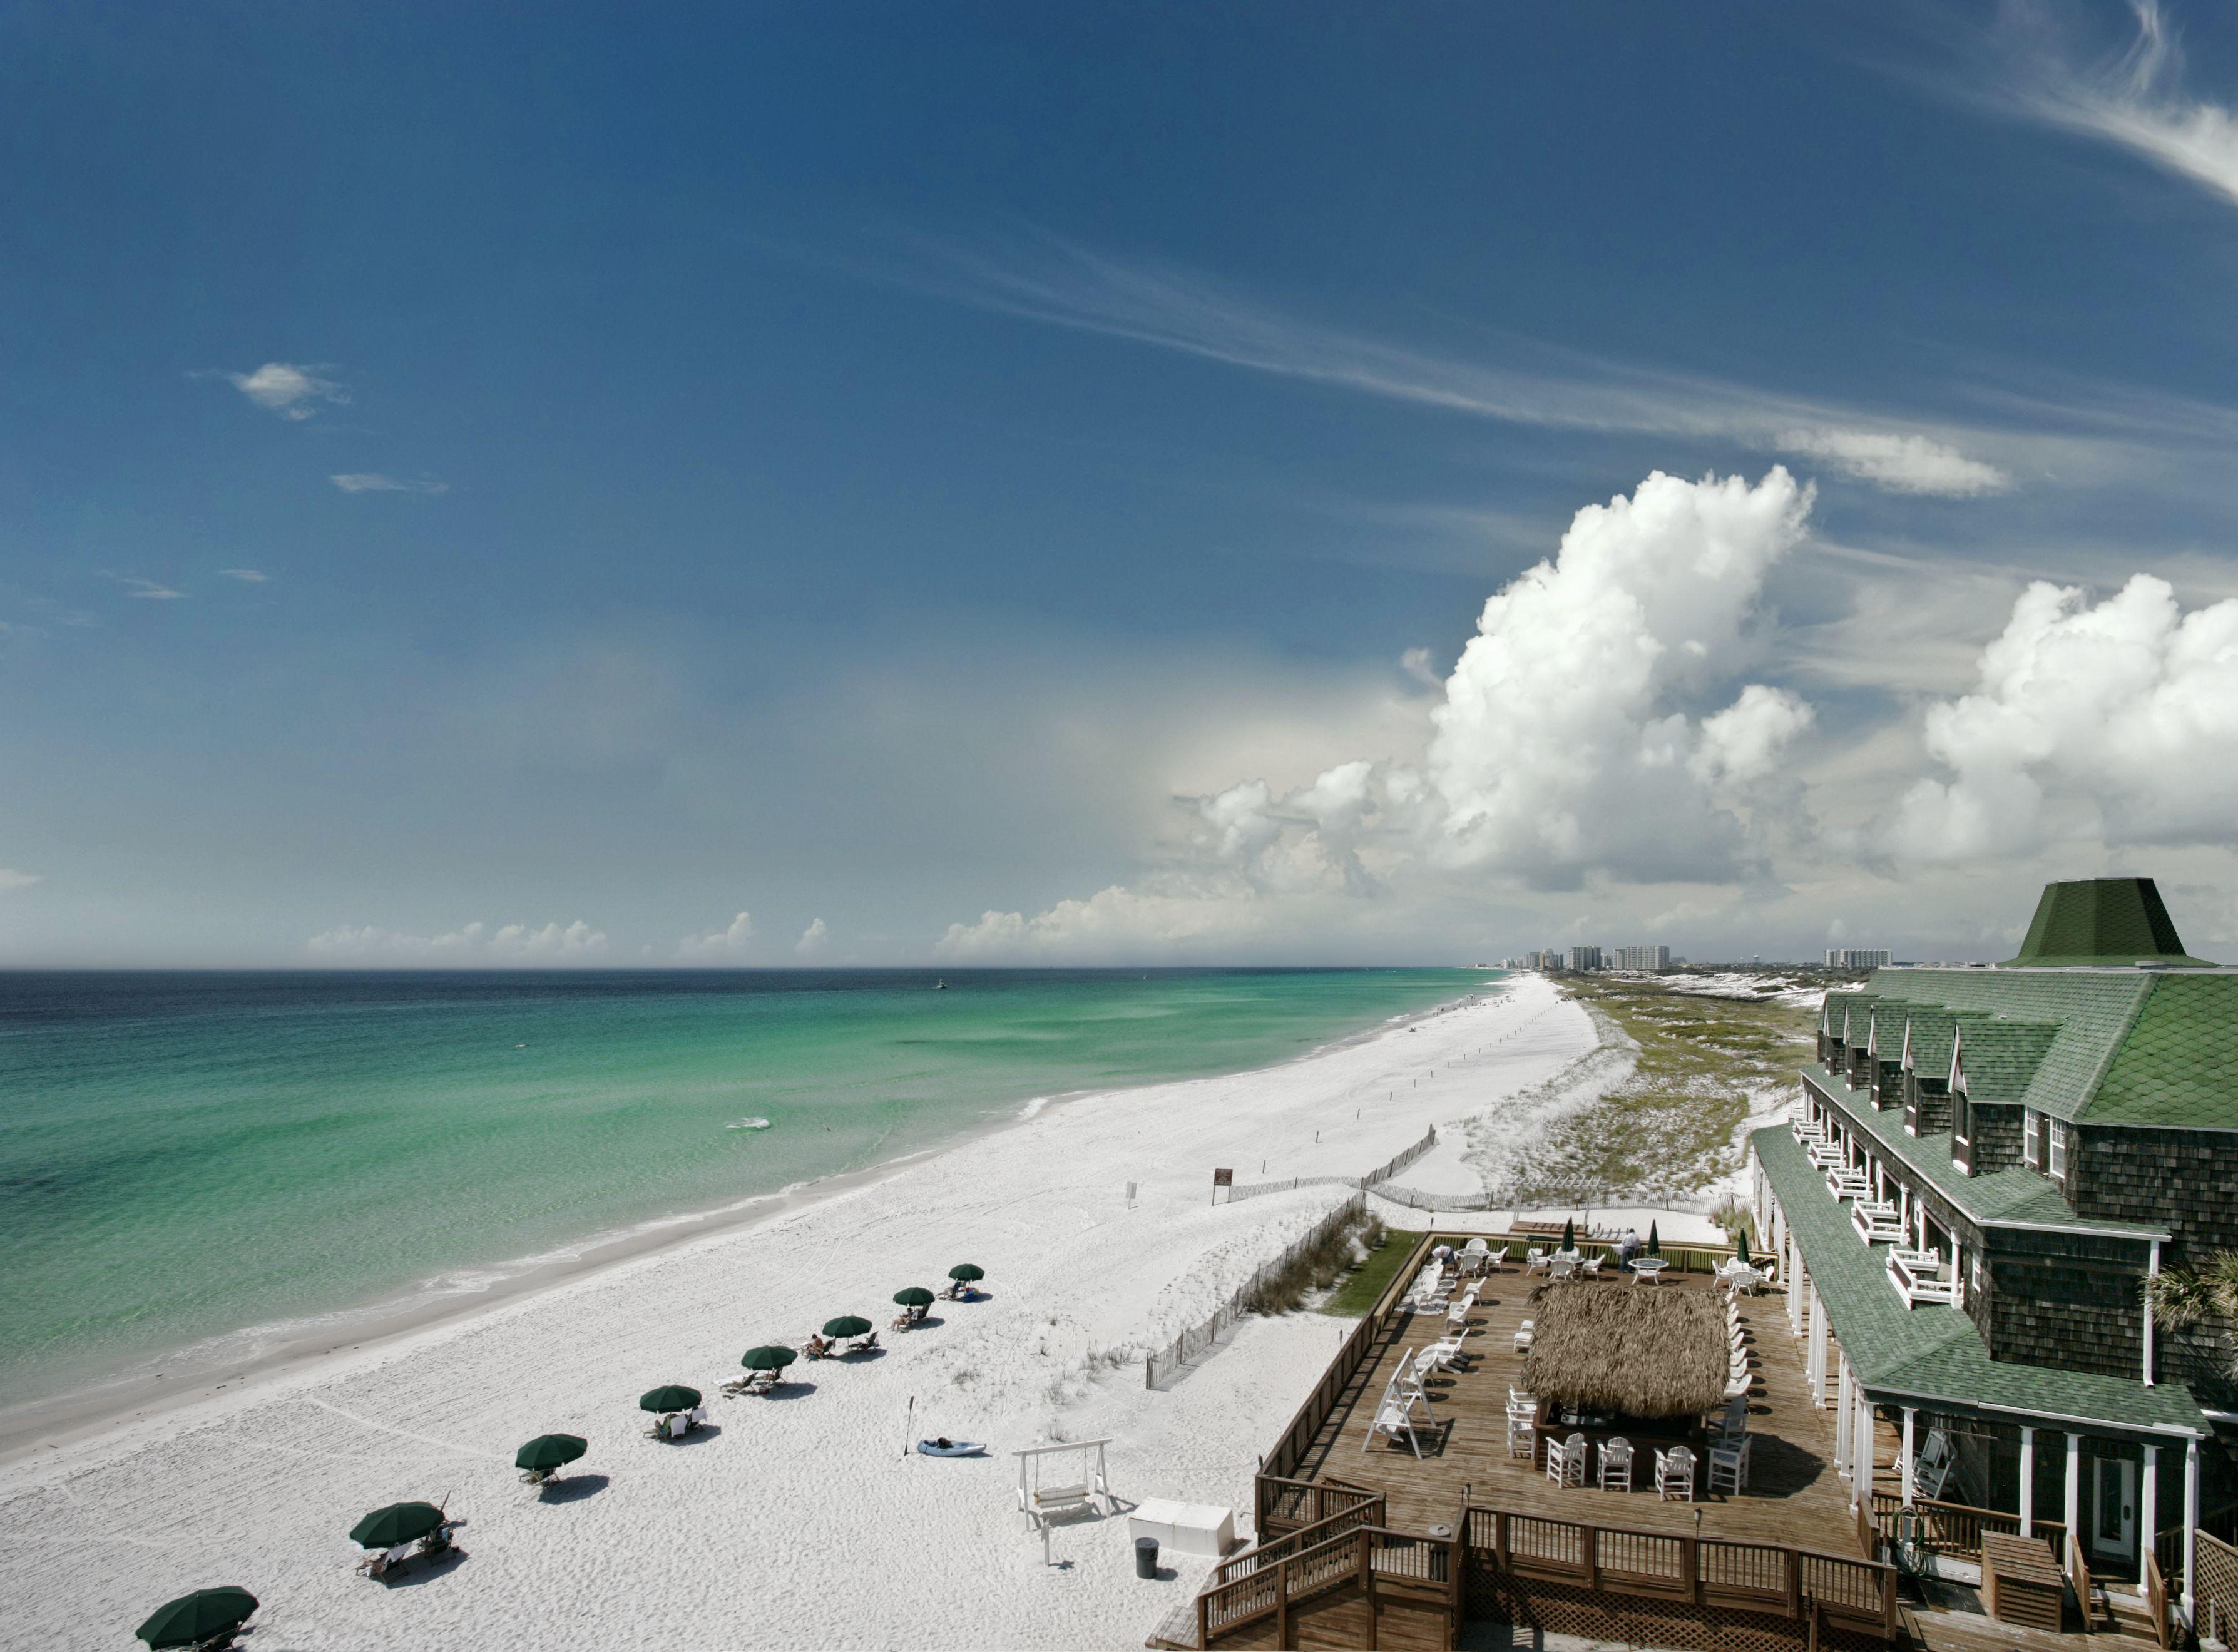 Henderson Park Inn Is The Premier Destin Florida Beach Hotel And A Long Time Favorite Getaway Enjoy Perfect Blend Of Charm Grace Embraced